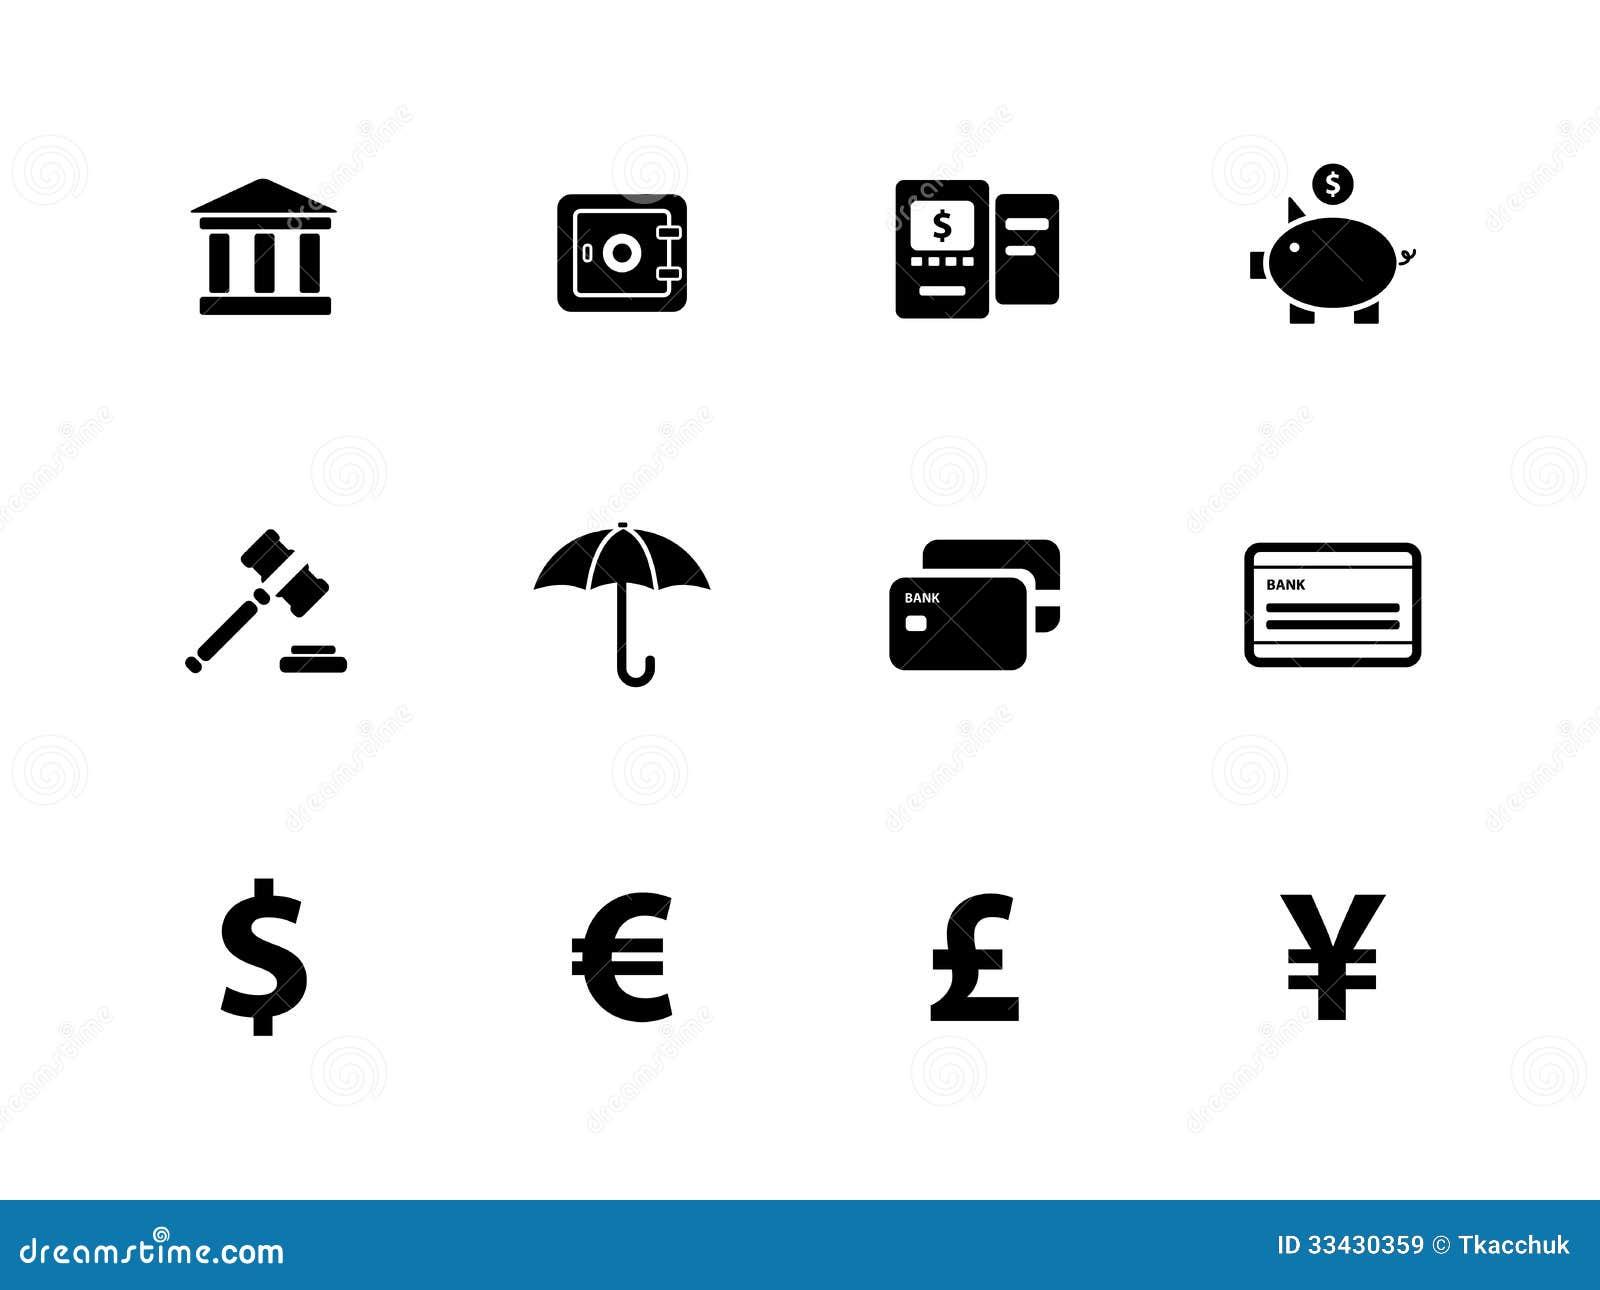 banking icons on white background  royalty free stock